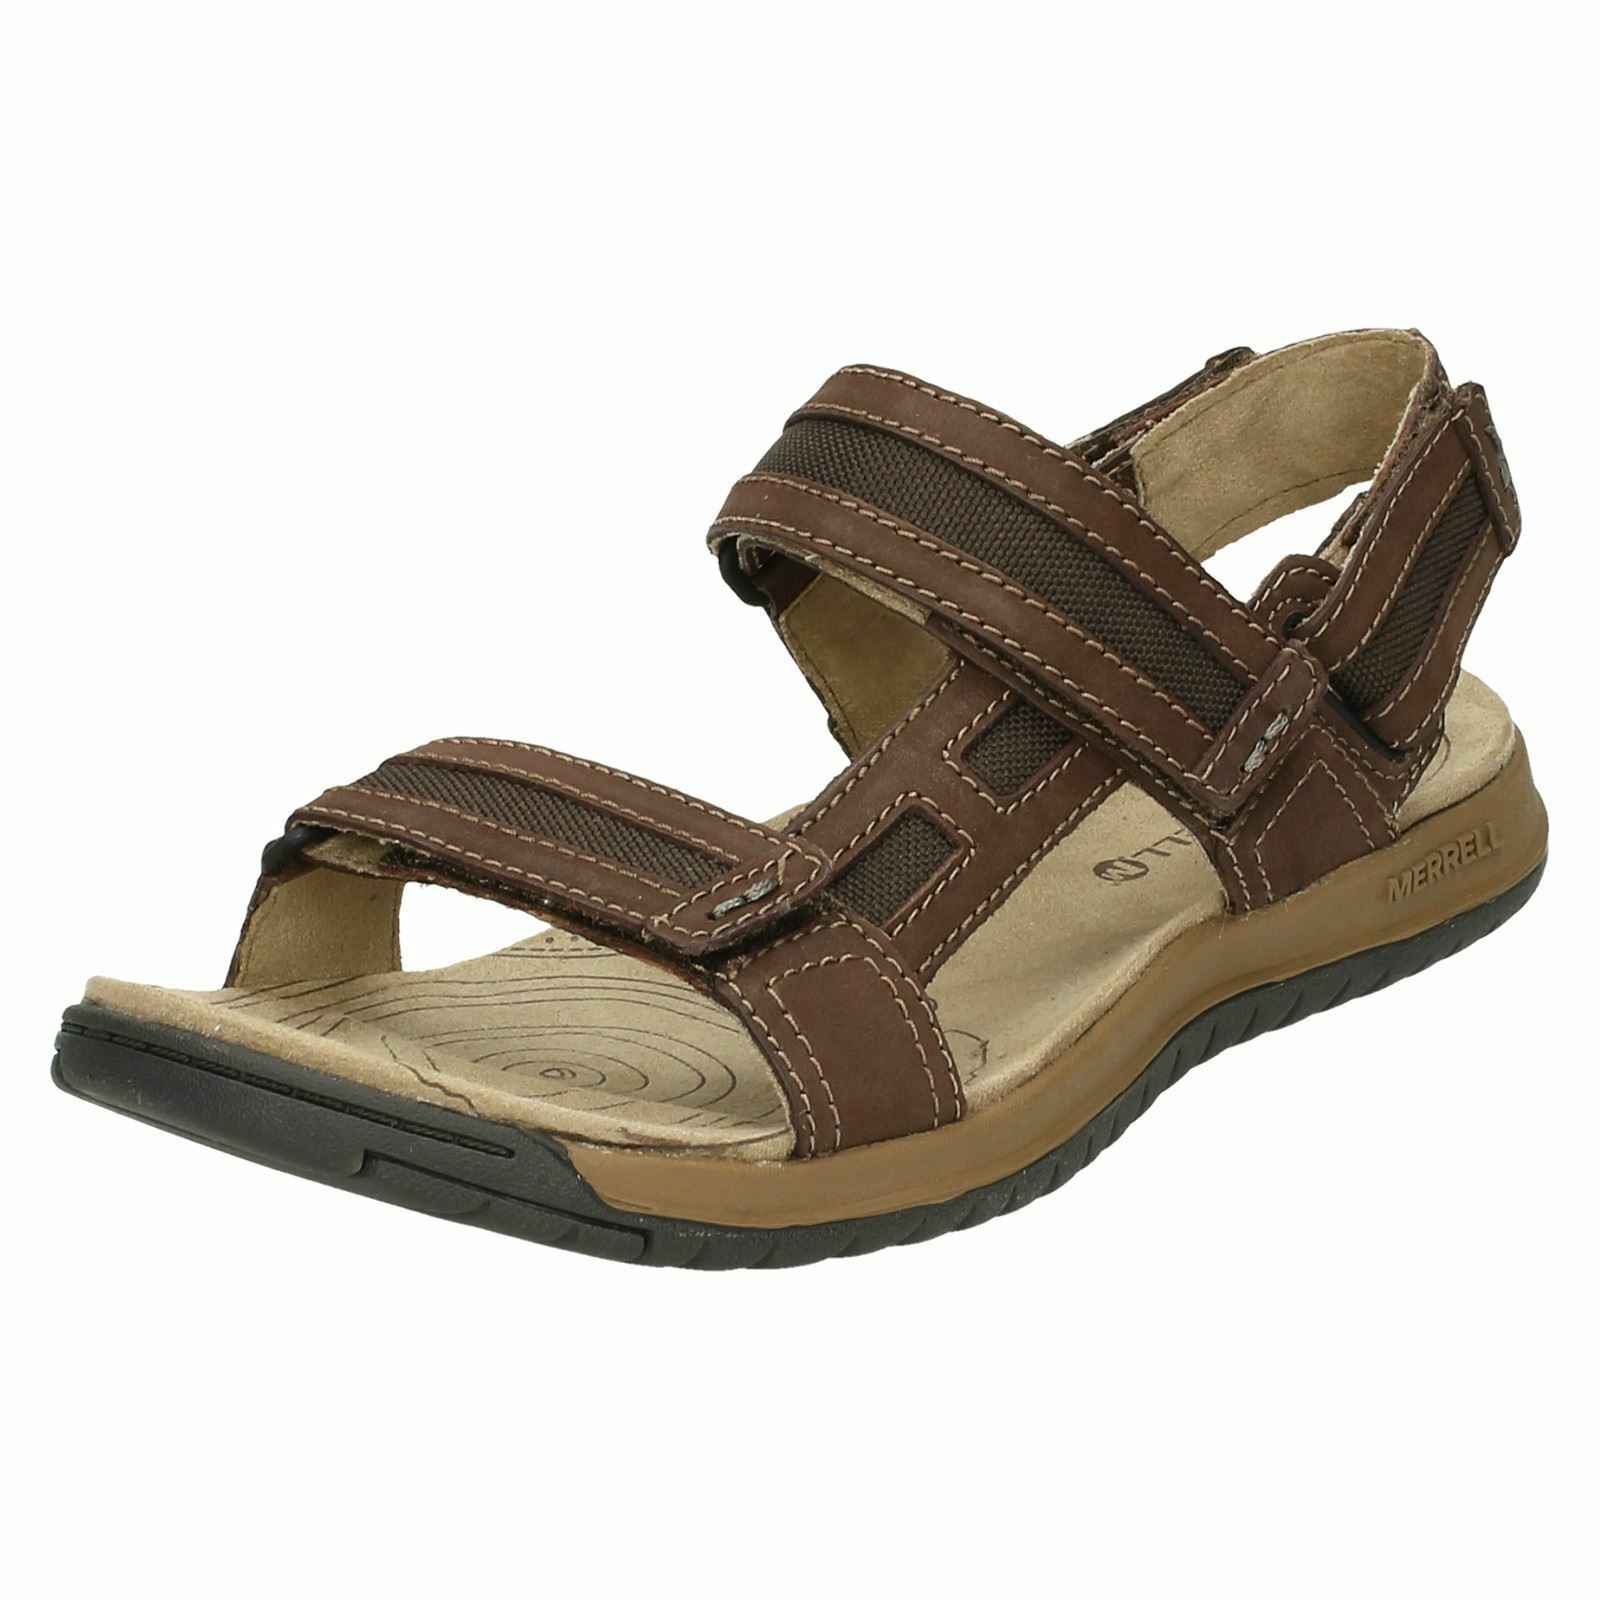 Mens Merrell Traveler Tilt Convertible Espresso Brown Leather Casual Sandals